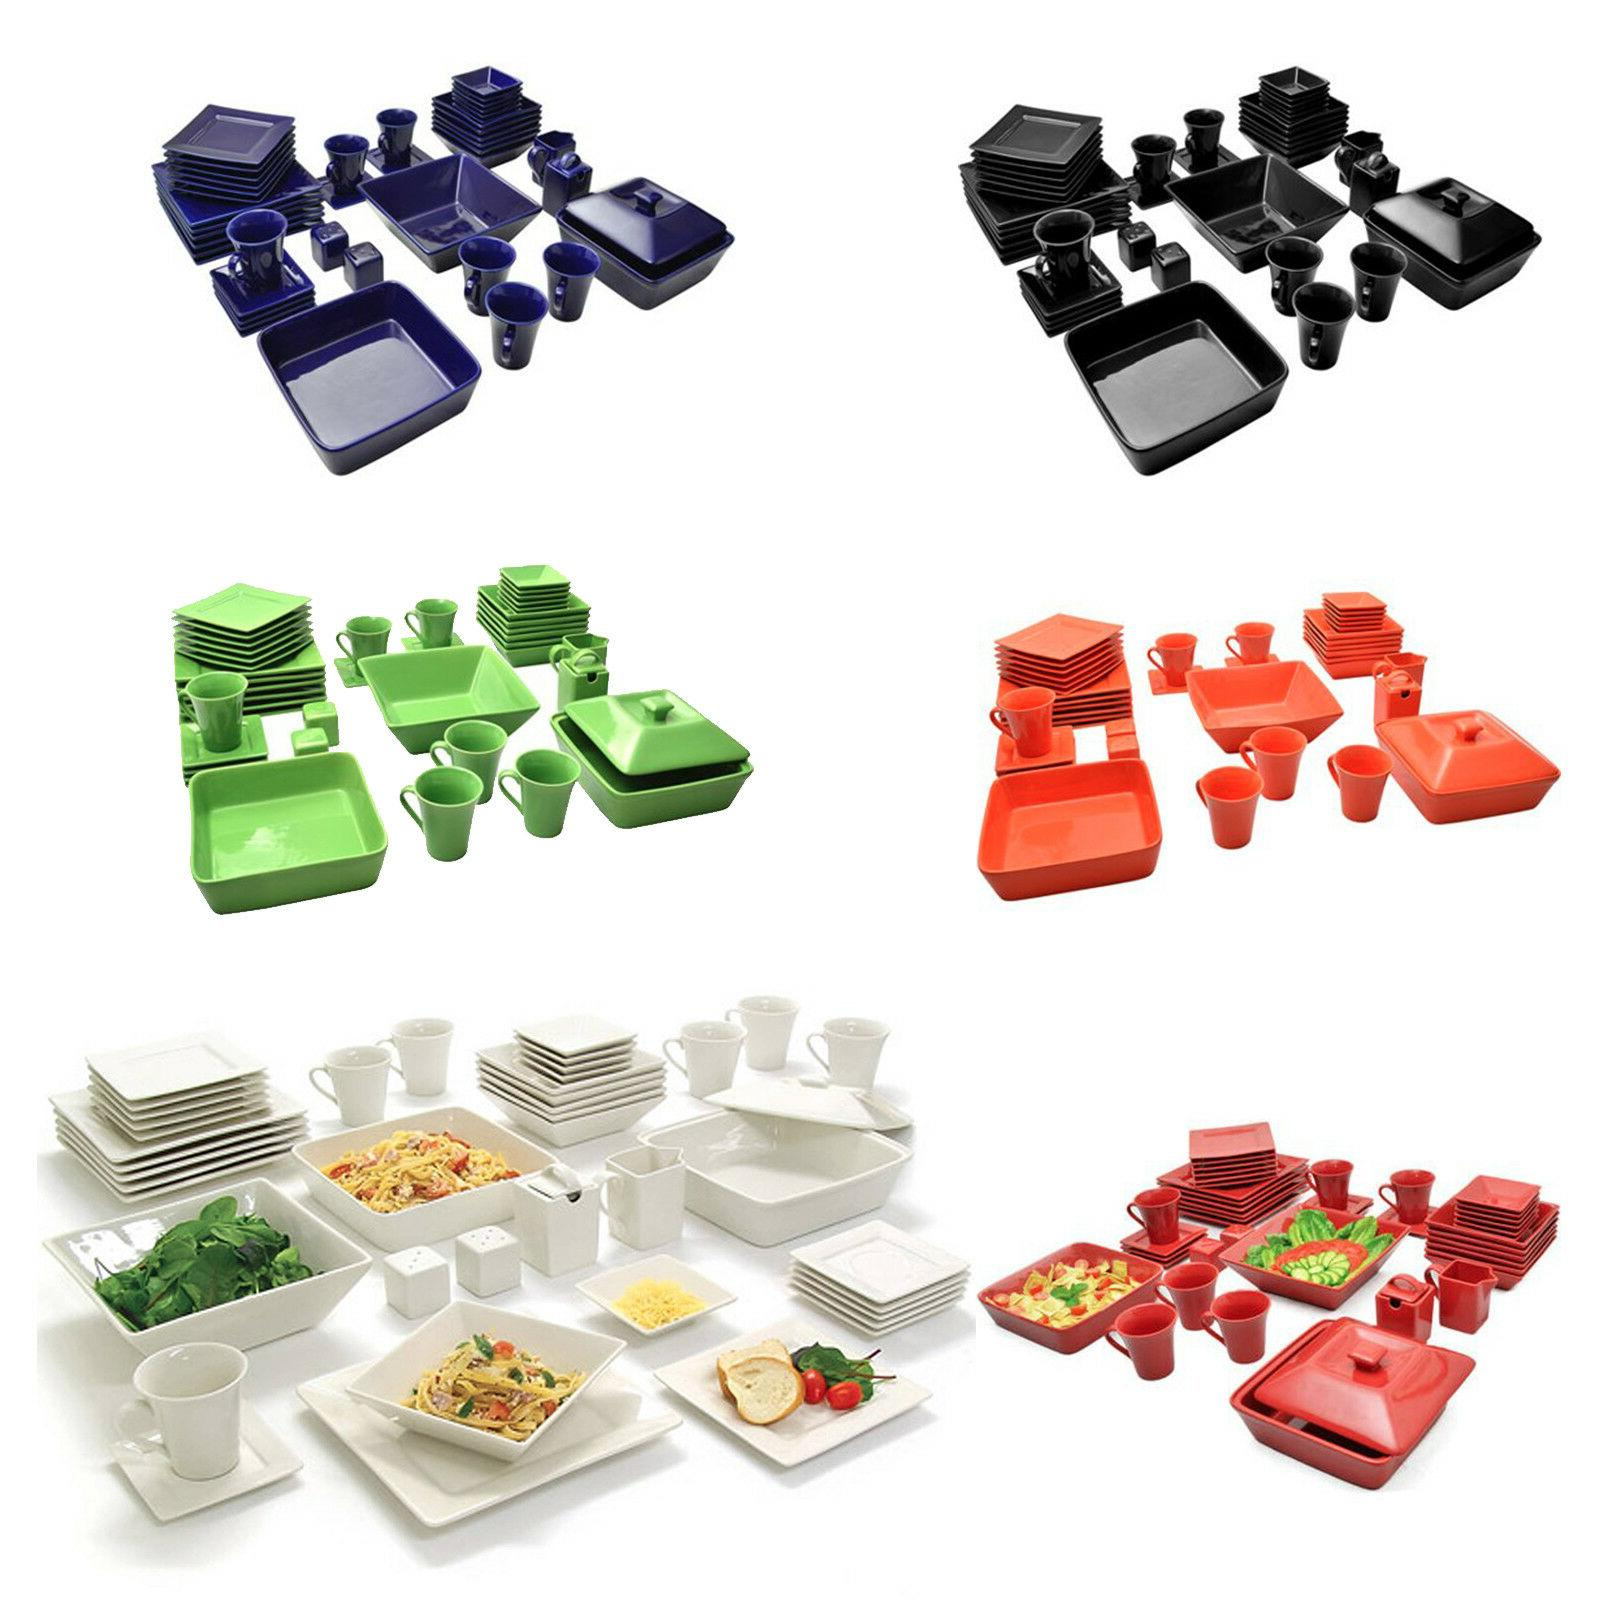 45 piece square dinnerware set for 6